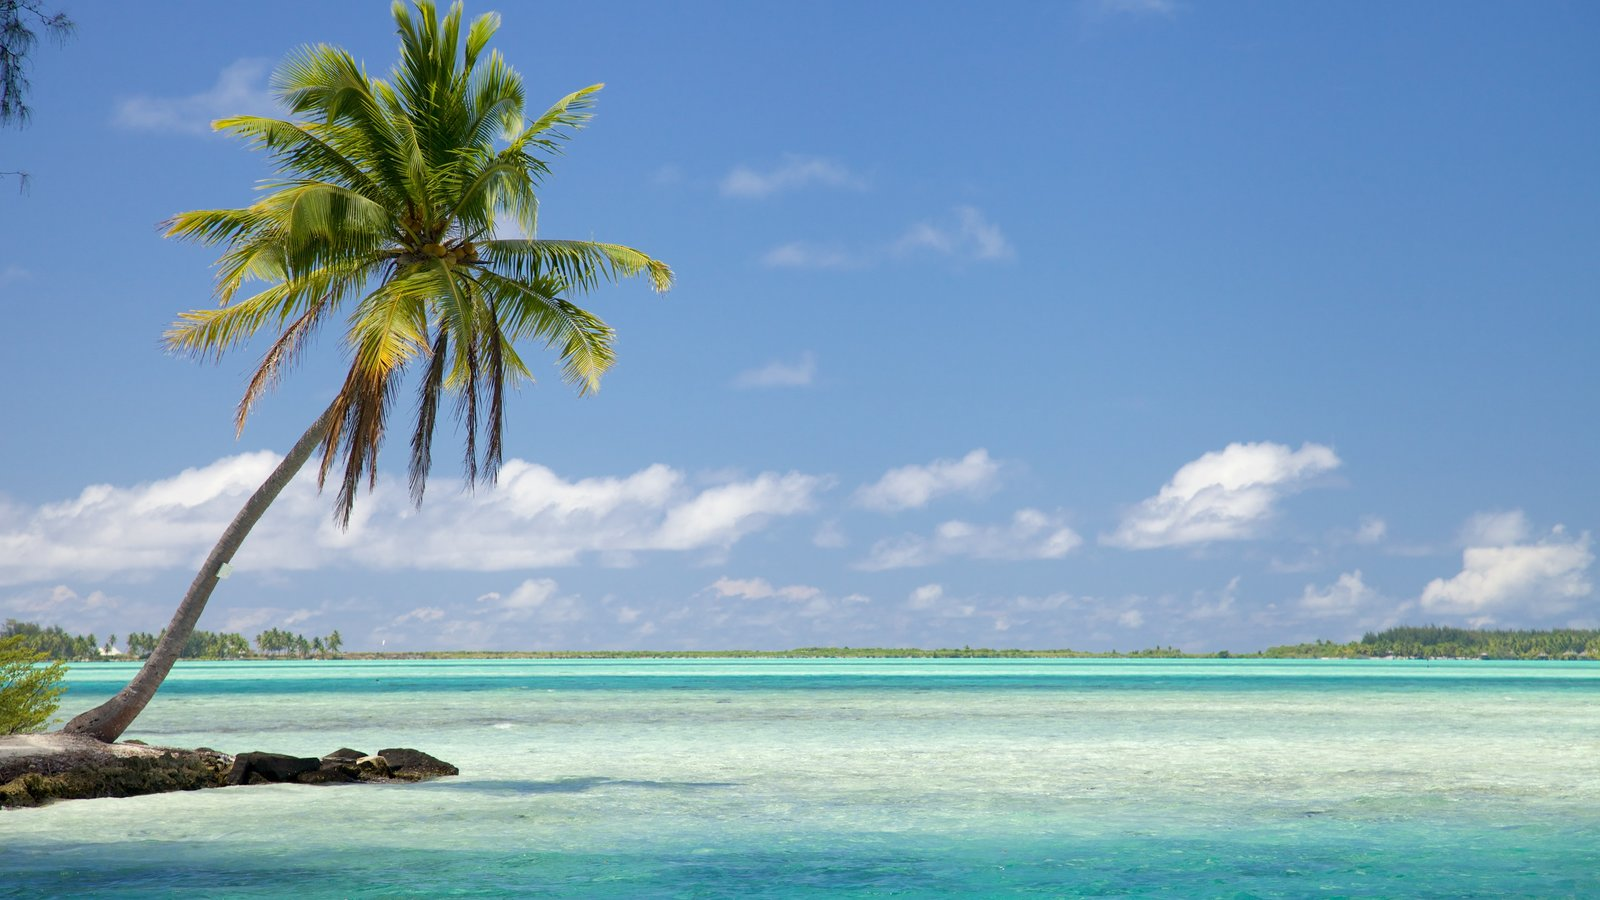 Bora Bora featuring landscape views, general coastal views and tropical scenes